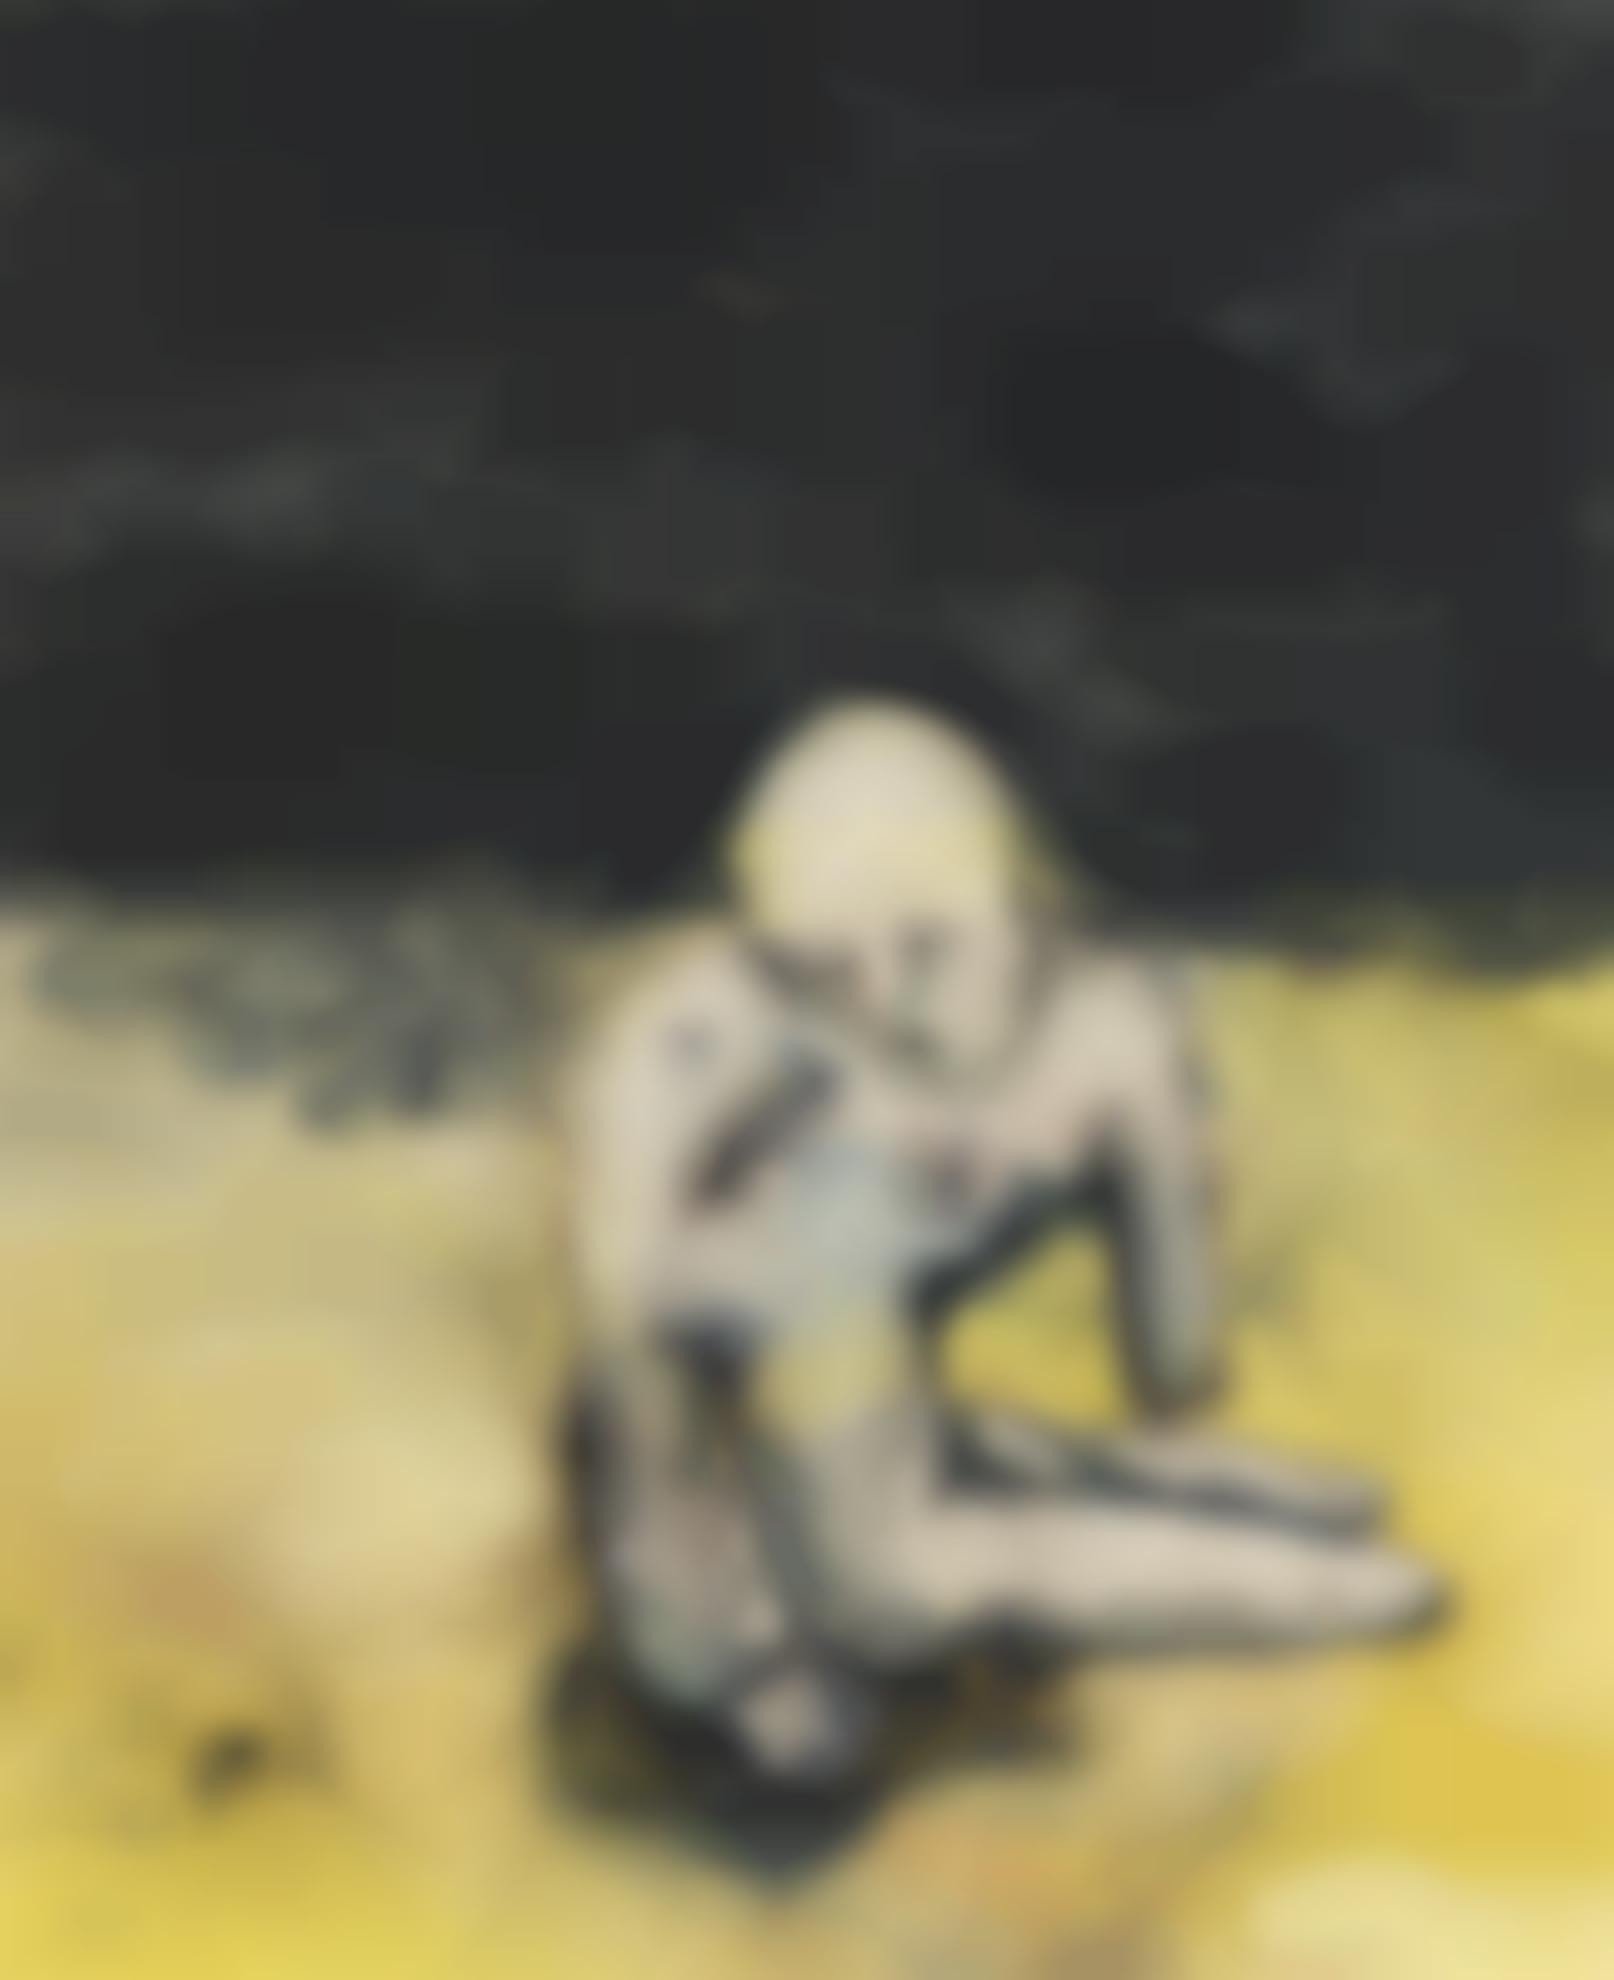 Georg Baselitz-Grosse Nacht Im Eimer-1963